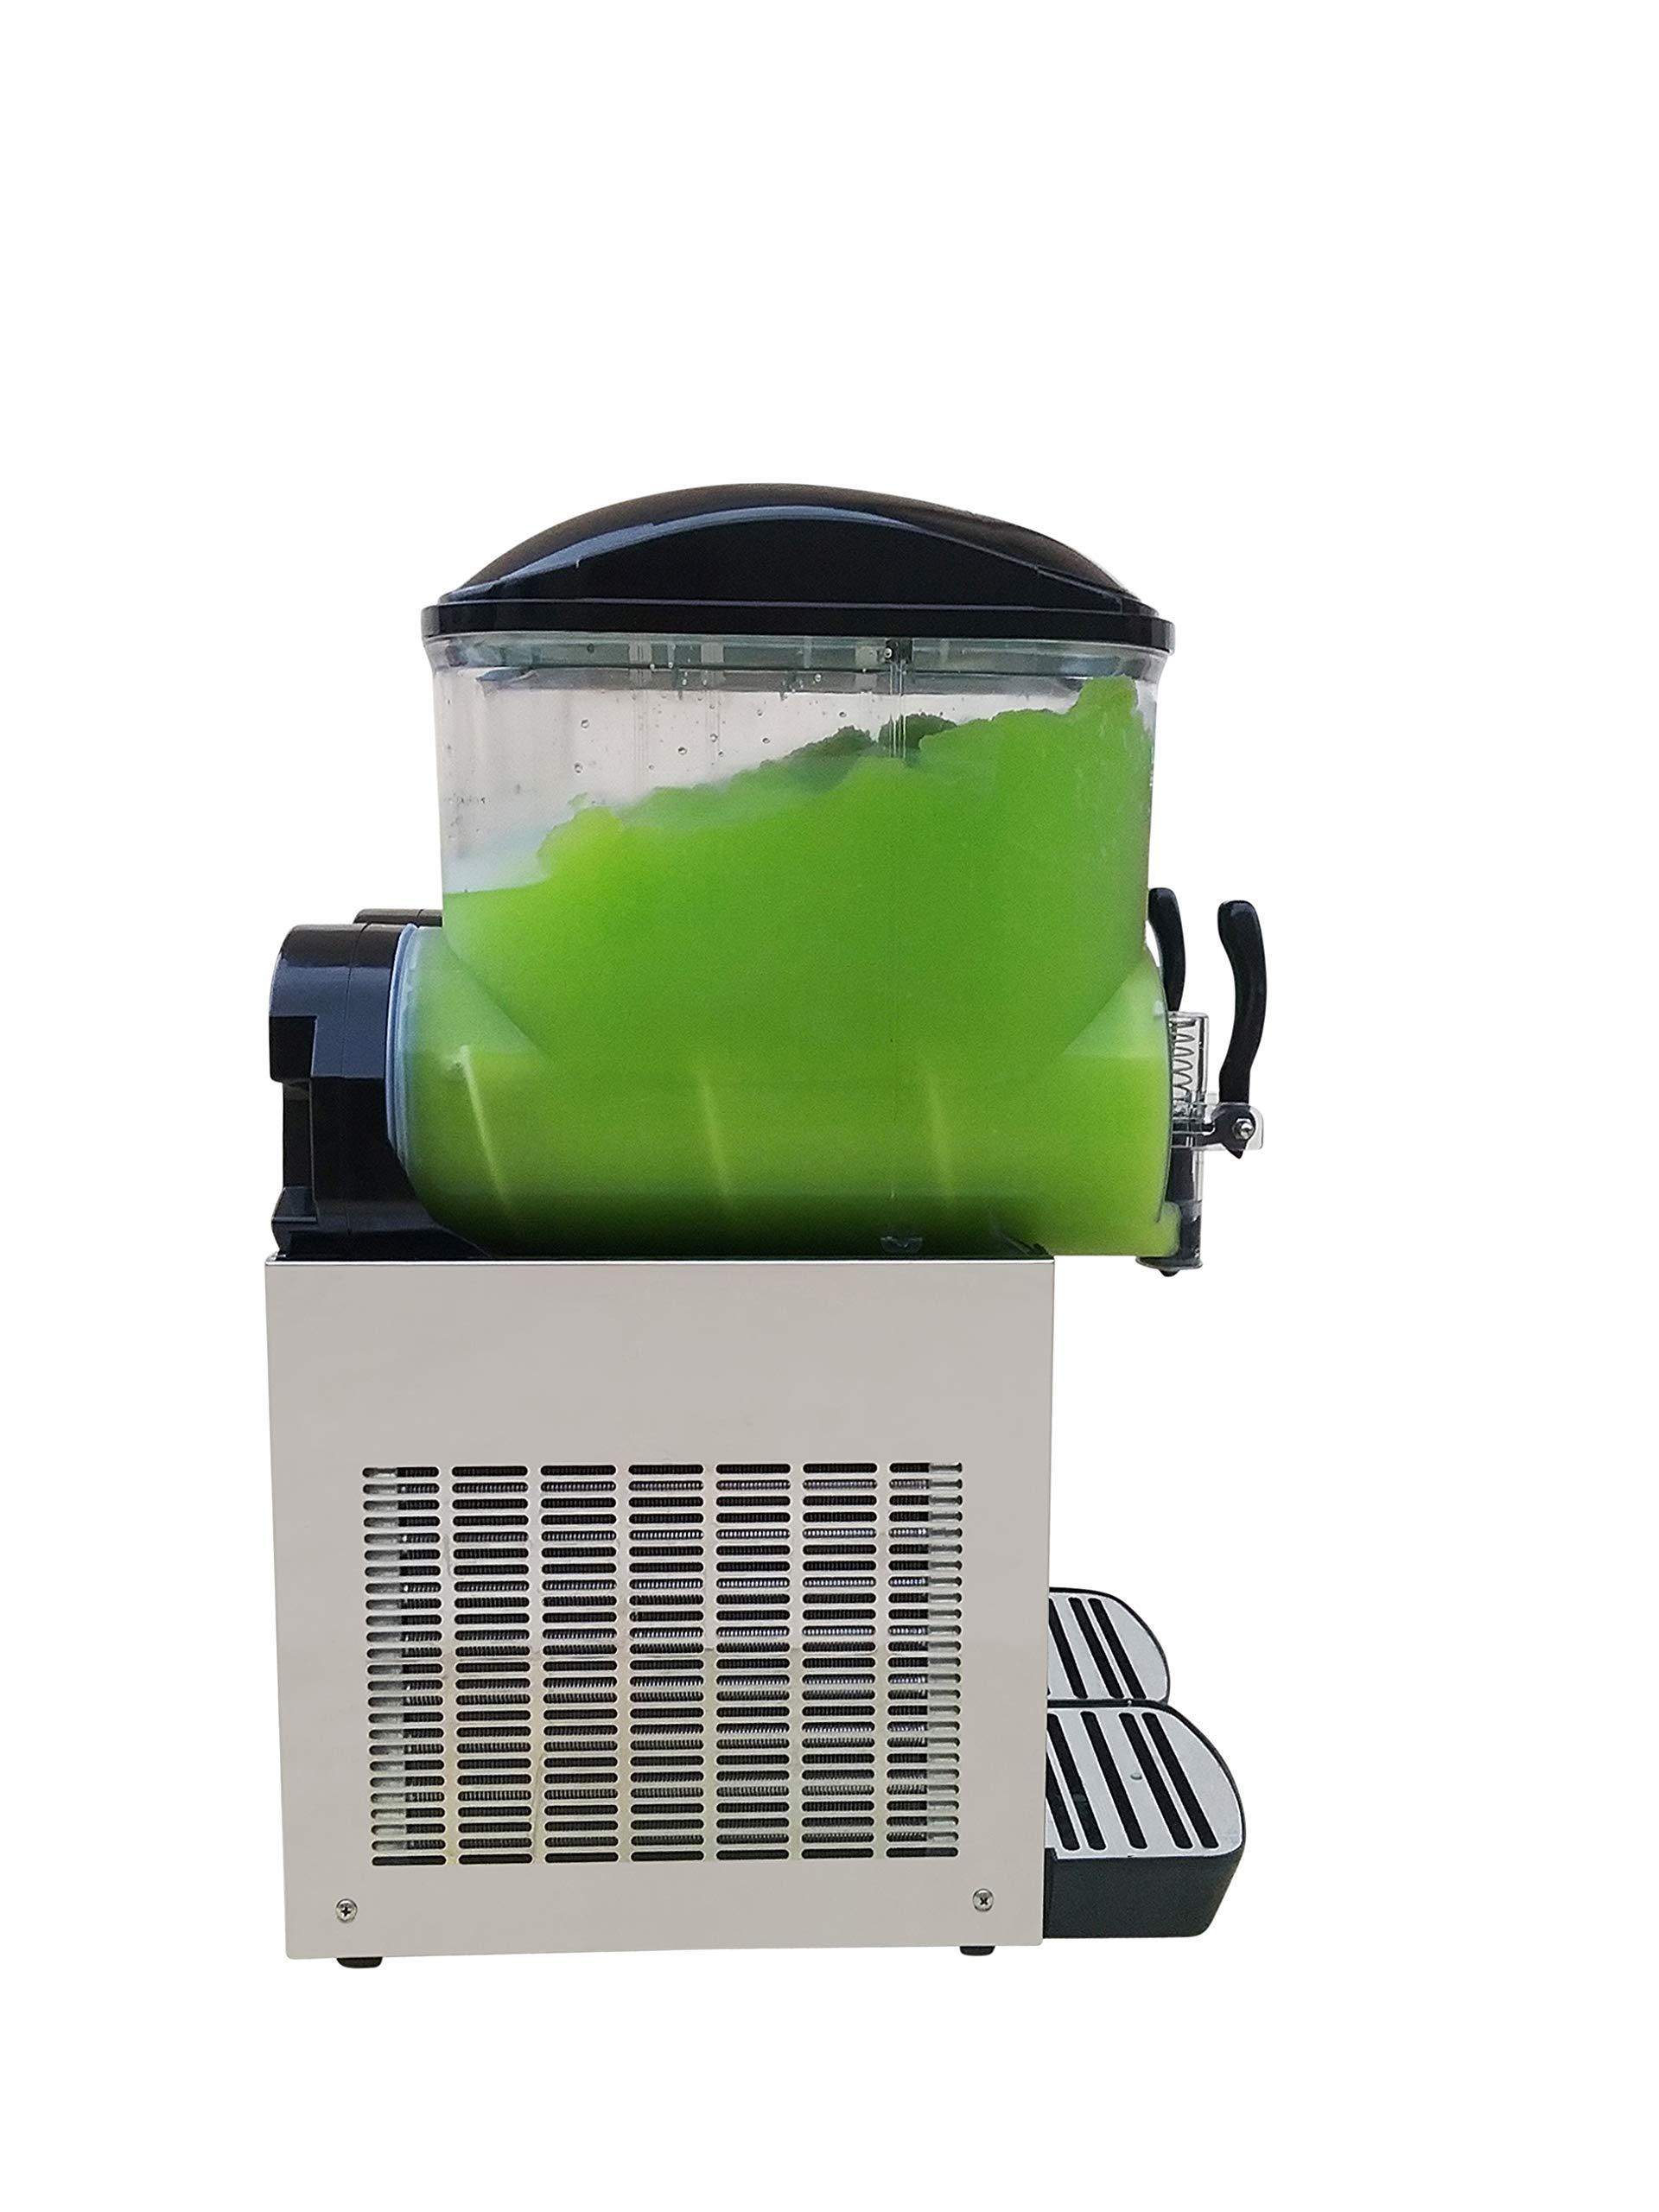 Brand : BRAVO ITALIA 2 bowls slushie machine 3.2 gallons each bowl , 100 CUPS ,COMMERCIAL GRADE MACHINE ,Margarita Machine , Slushie Maker , Margarita Maker , Slushy Machine by BRAVO ITALIA (Image #3)